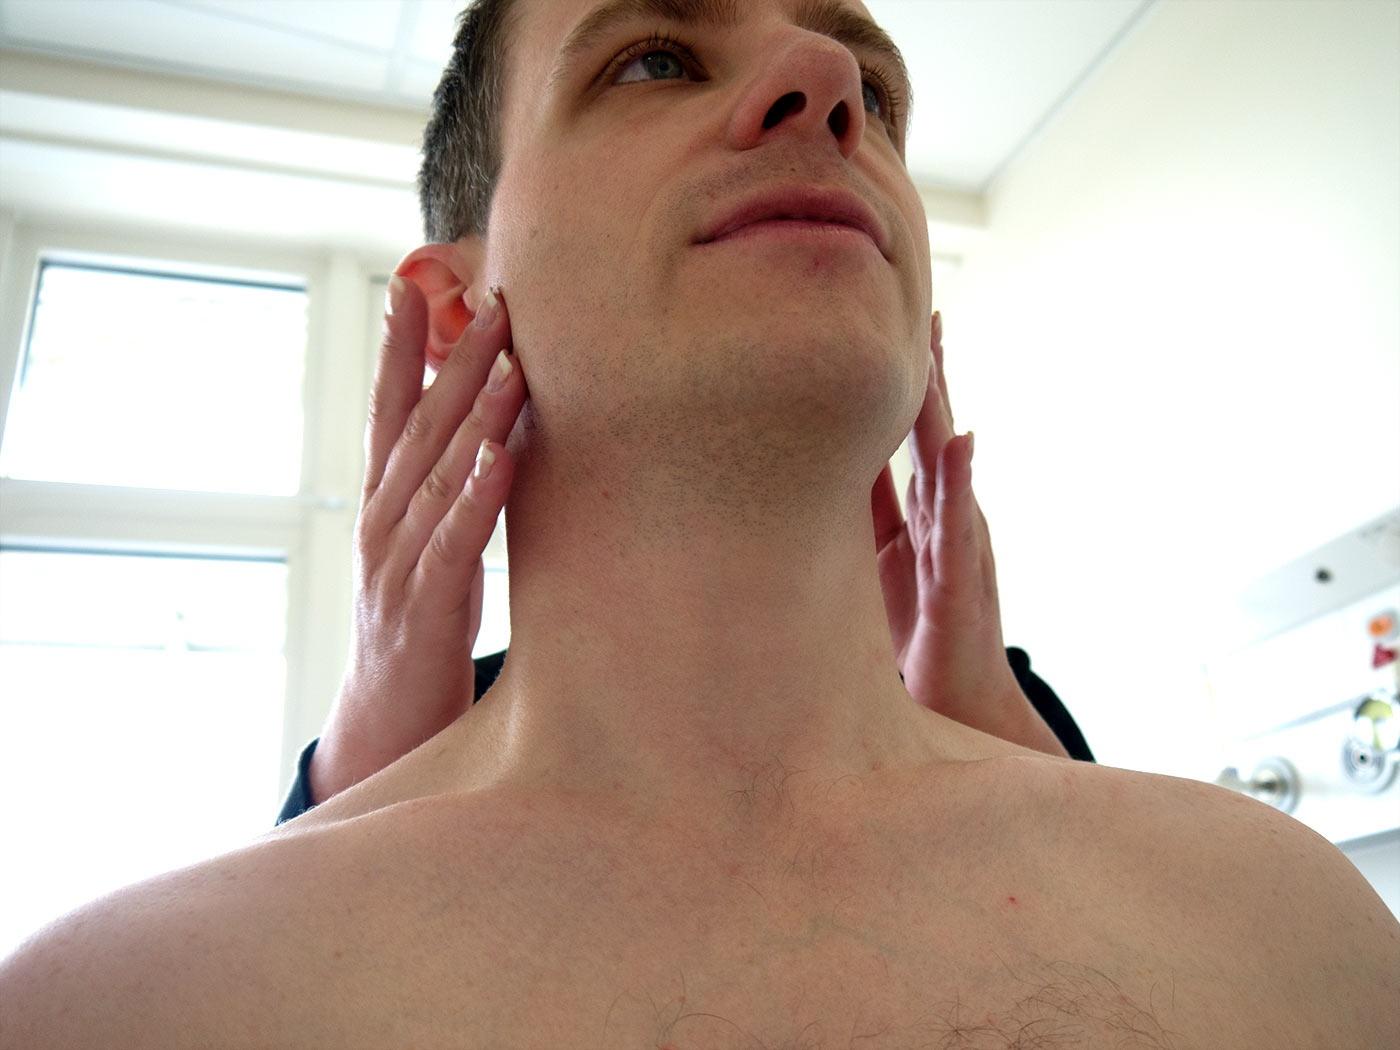 Palpate the pre-auricular lymph nodes